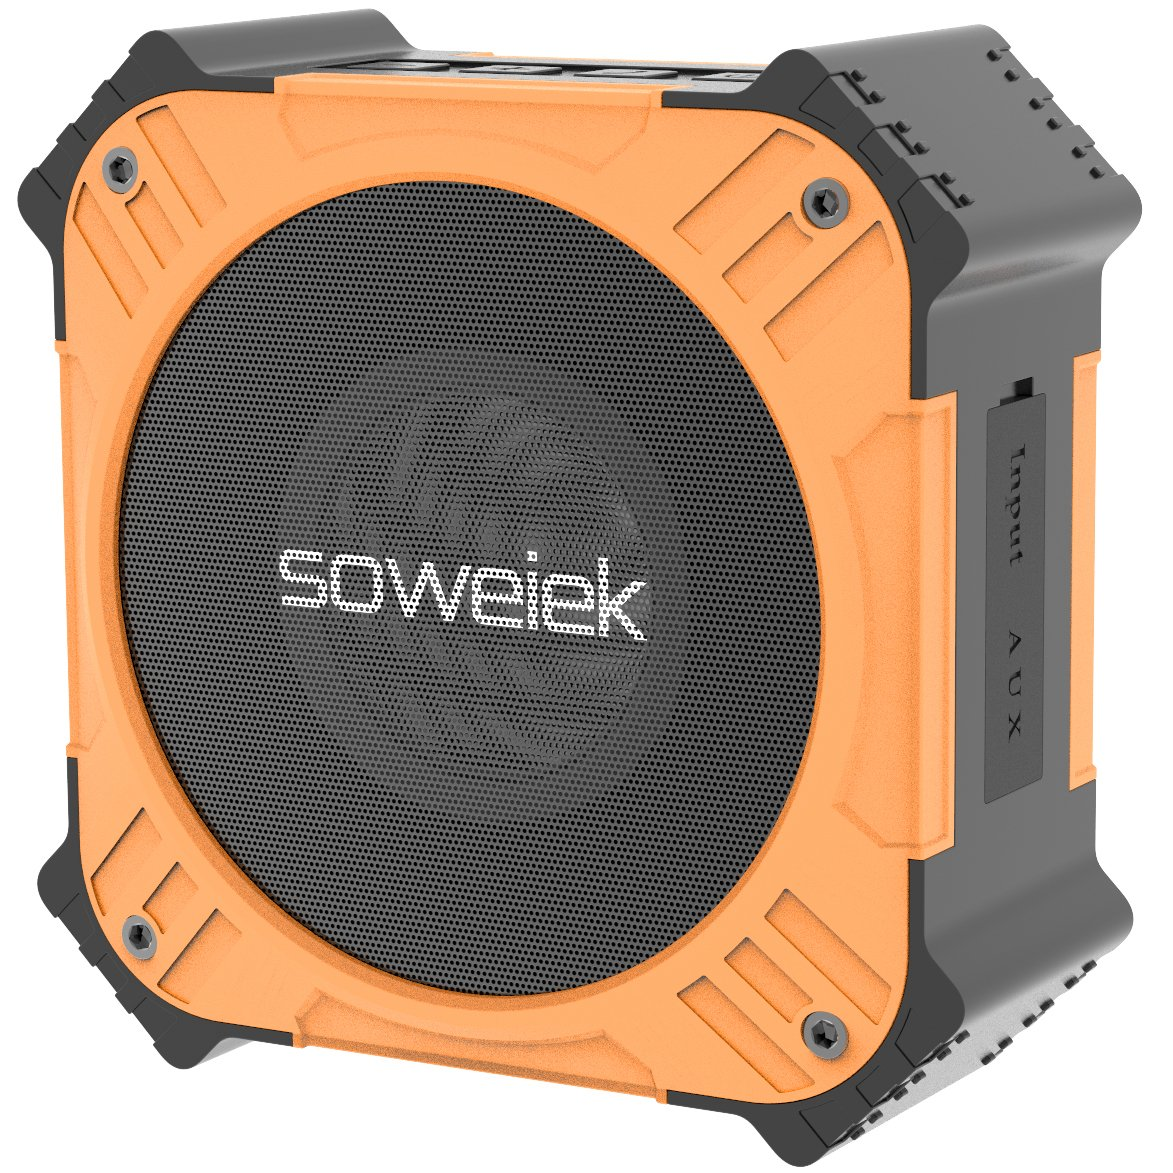 Solar-Powered Bluetooth Speaker, Soweiek Portable IPX6 Waterproof Wireless Speaker with 20 Hours Playtime HD Stereo Sound Deep Bass Mic AUX Durable Design - Orange by Soweiek